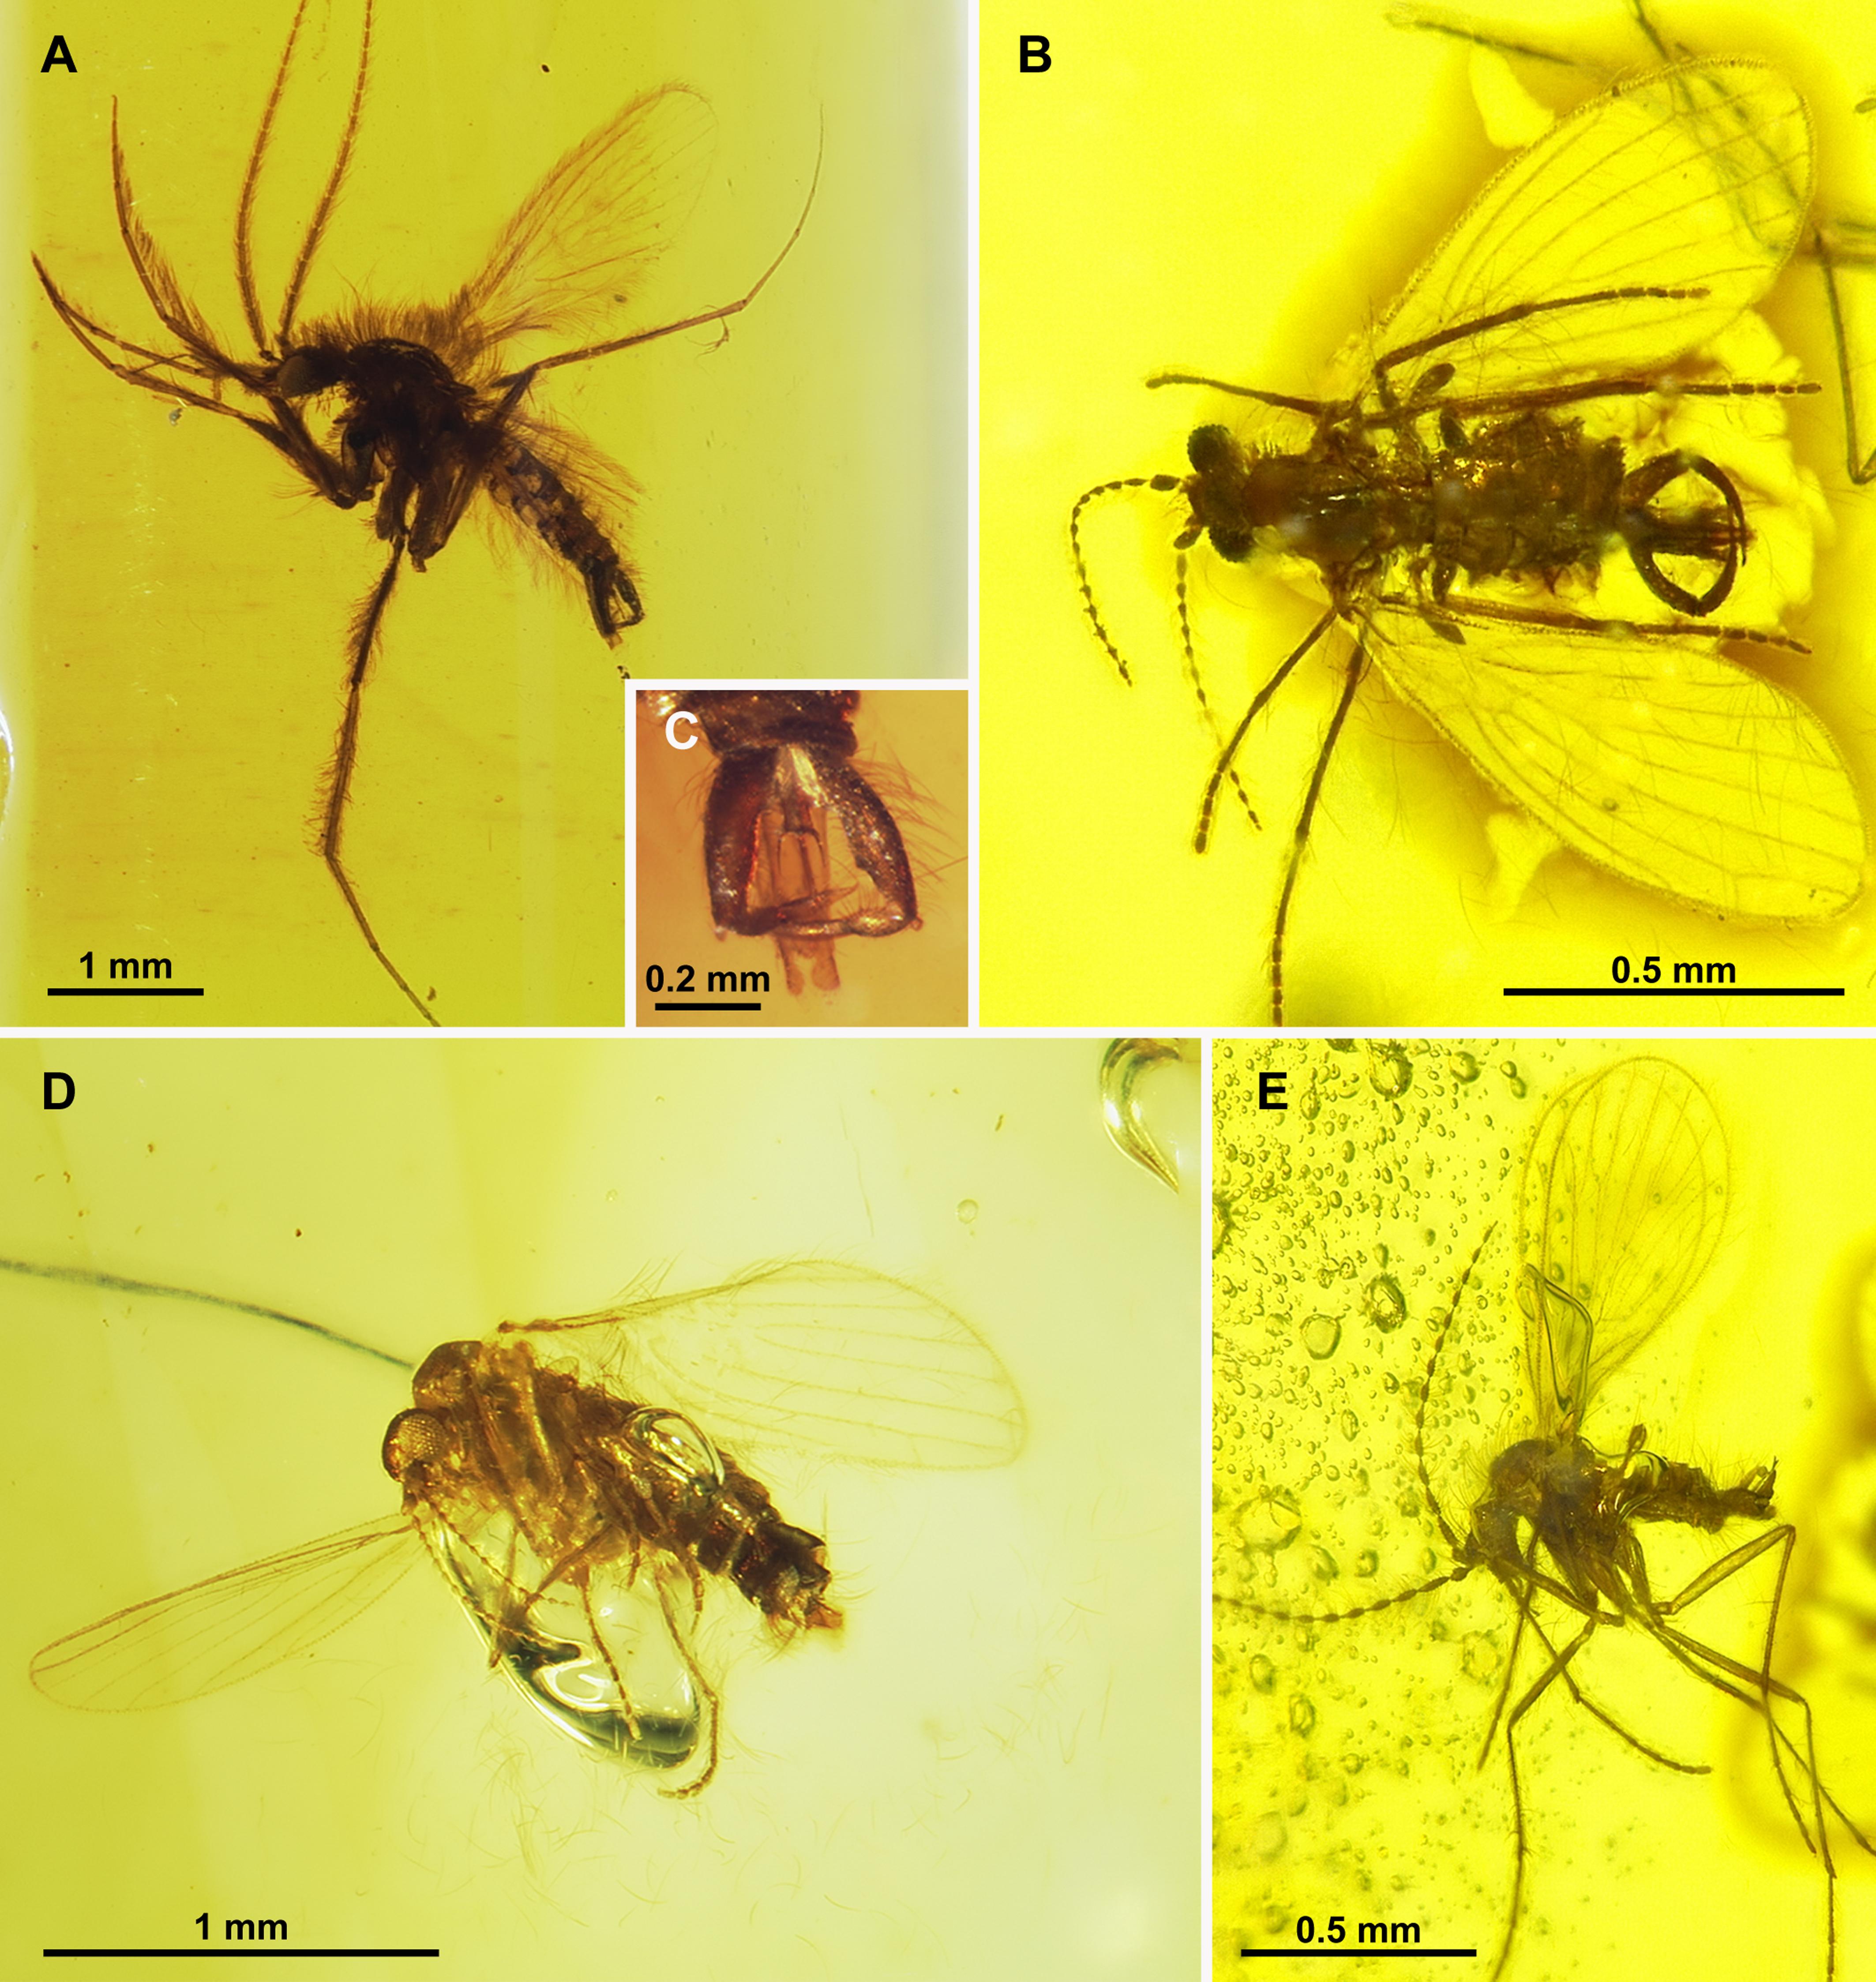 c0ec5bc83736 Moth flies and sand flies (Diptera  Psychodidae) in Cretaceous ...